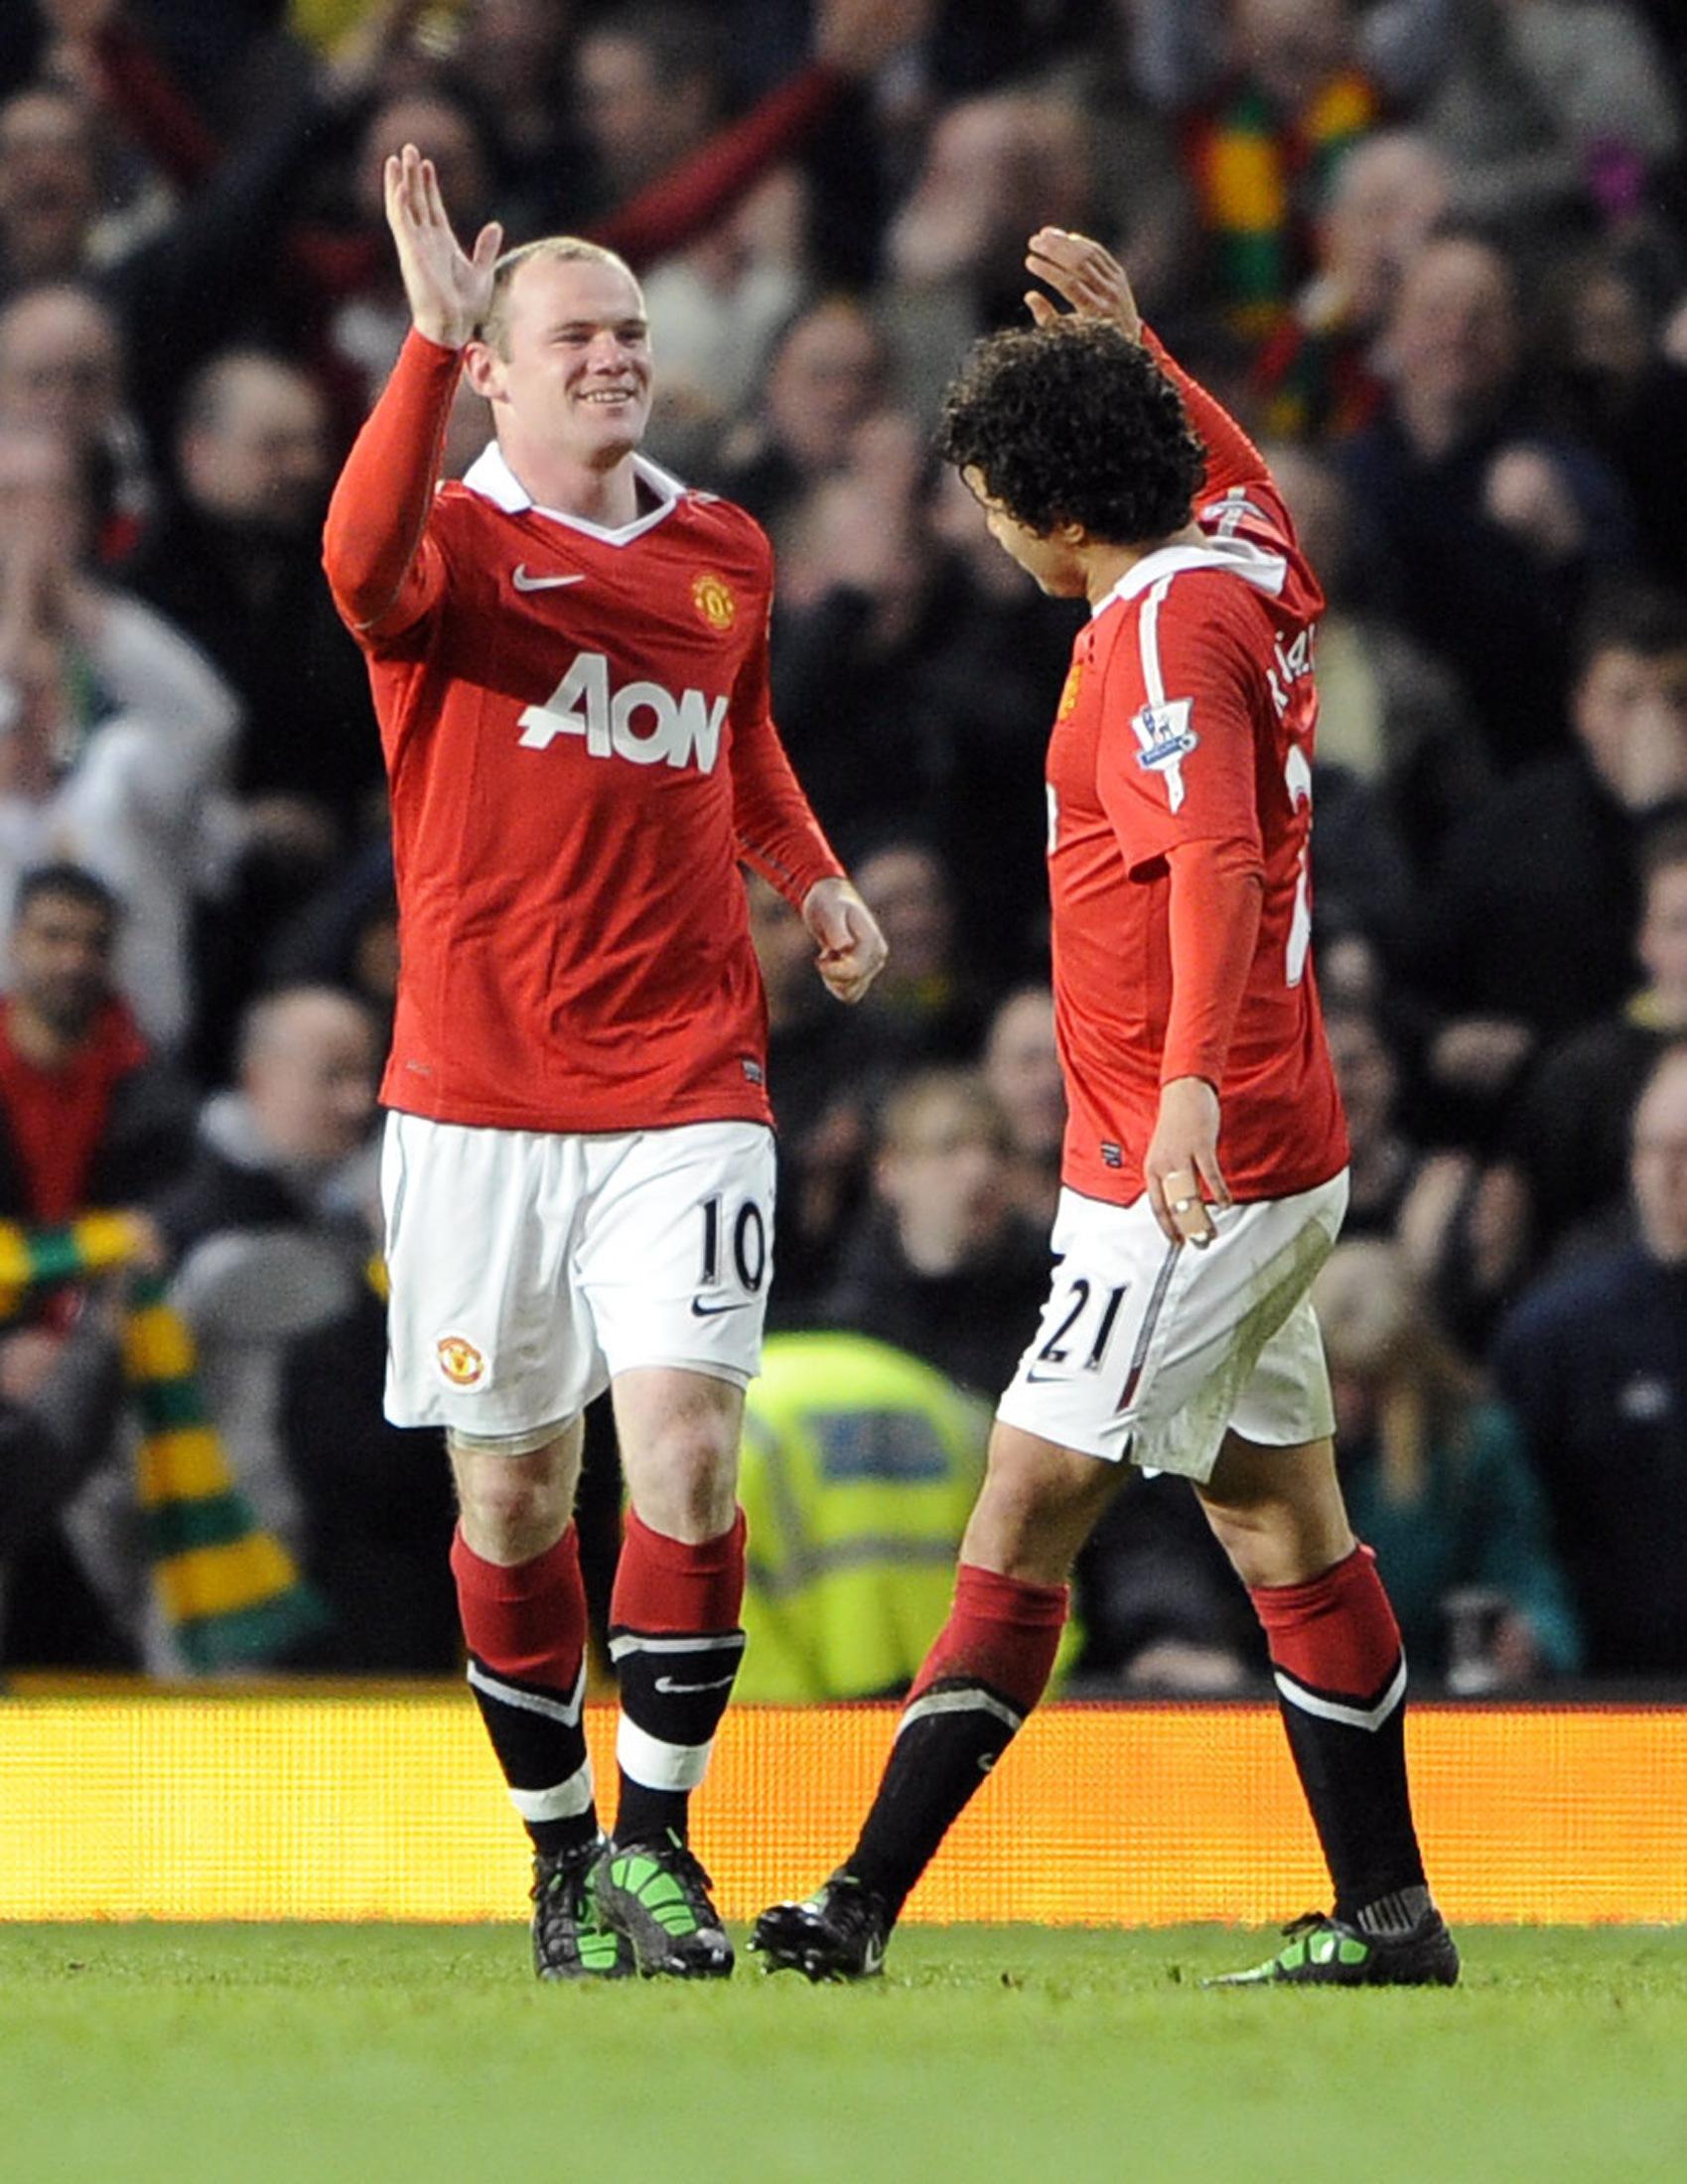 Wayne Rooney and Fabio scored as United beat Arsenal 2-0 that day